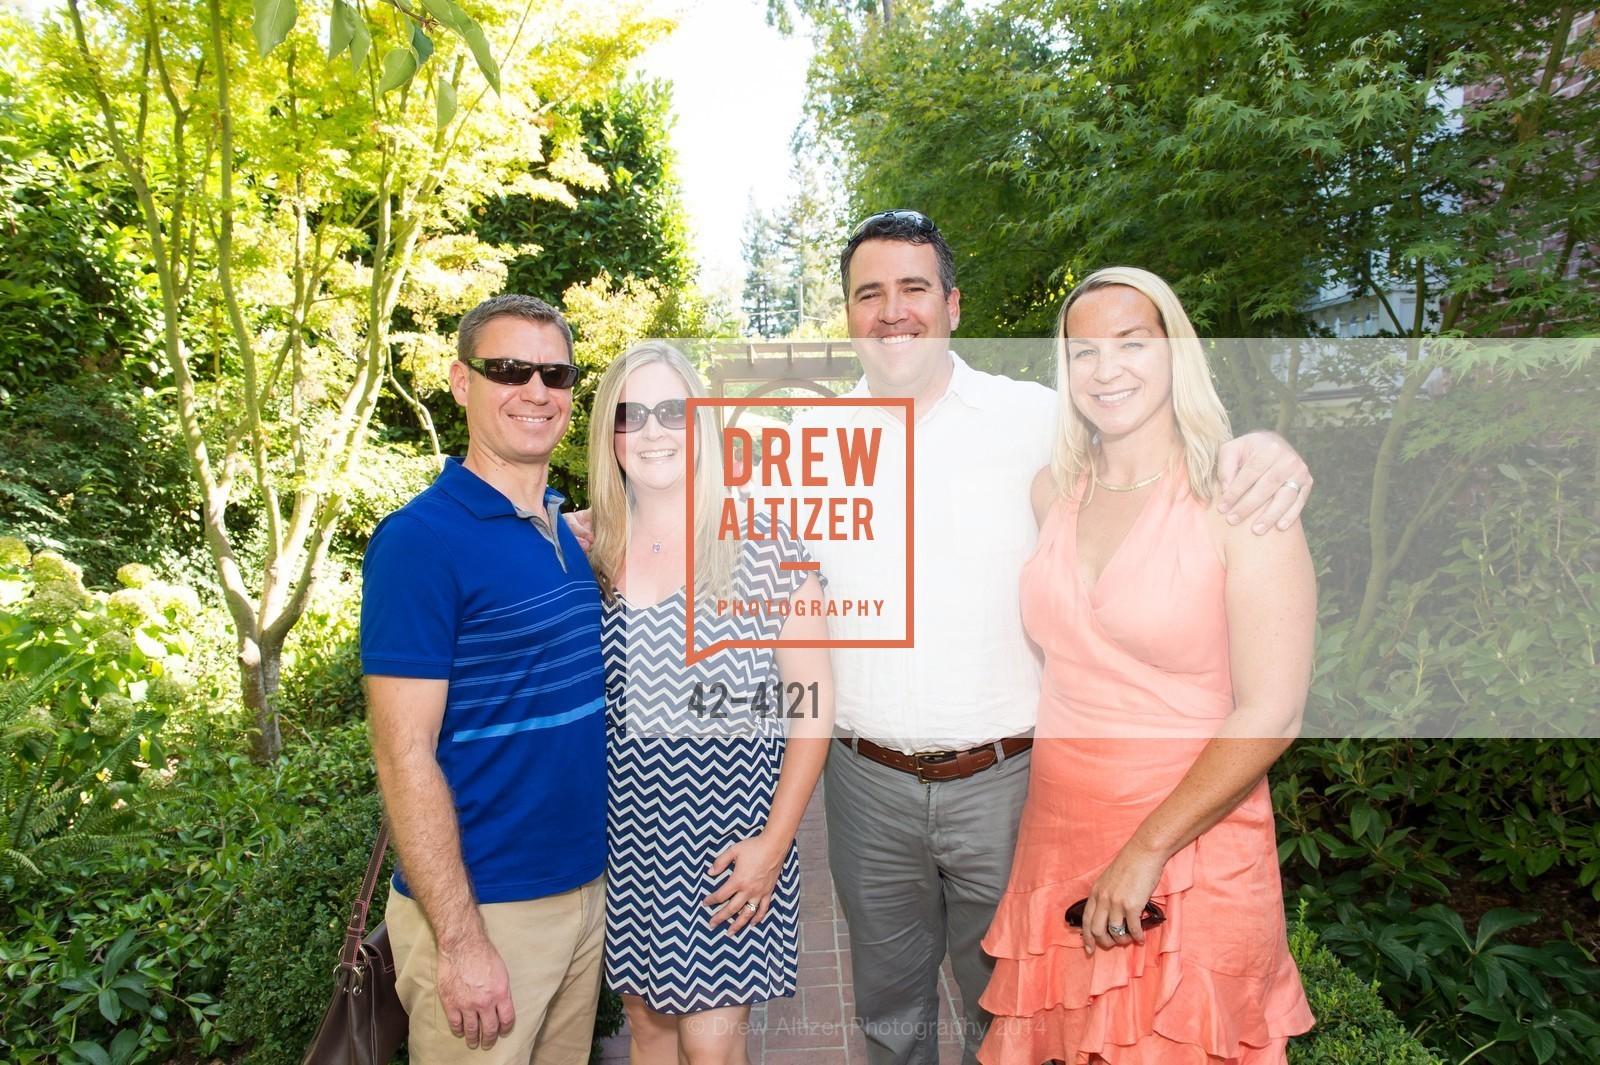 Colin Crawford, Nicole Crawford, Craig Crawford, Maggie Crawford, Photo #42-4121